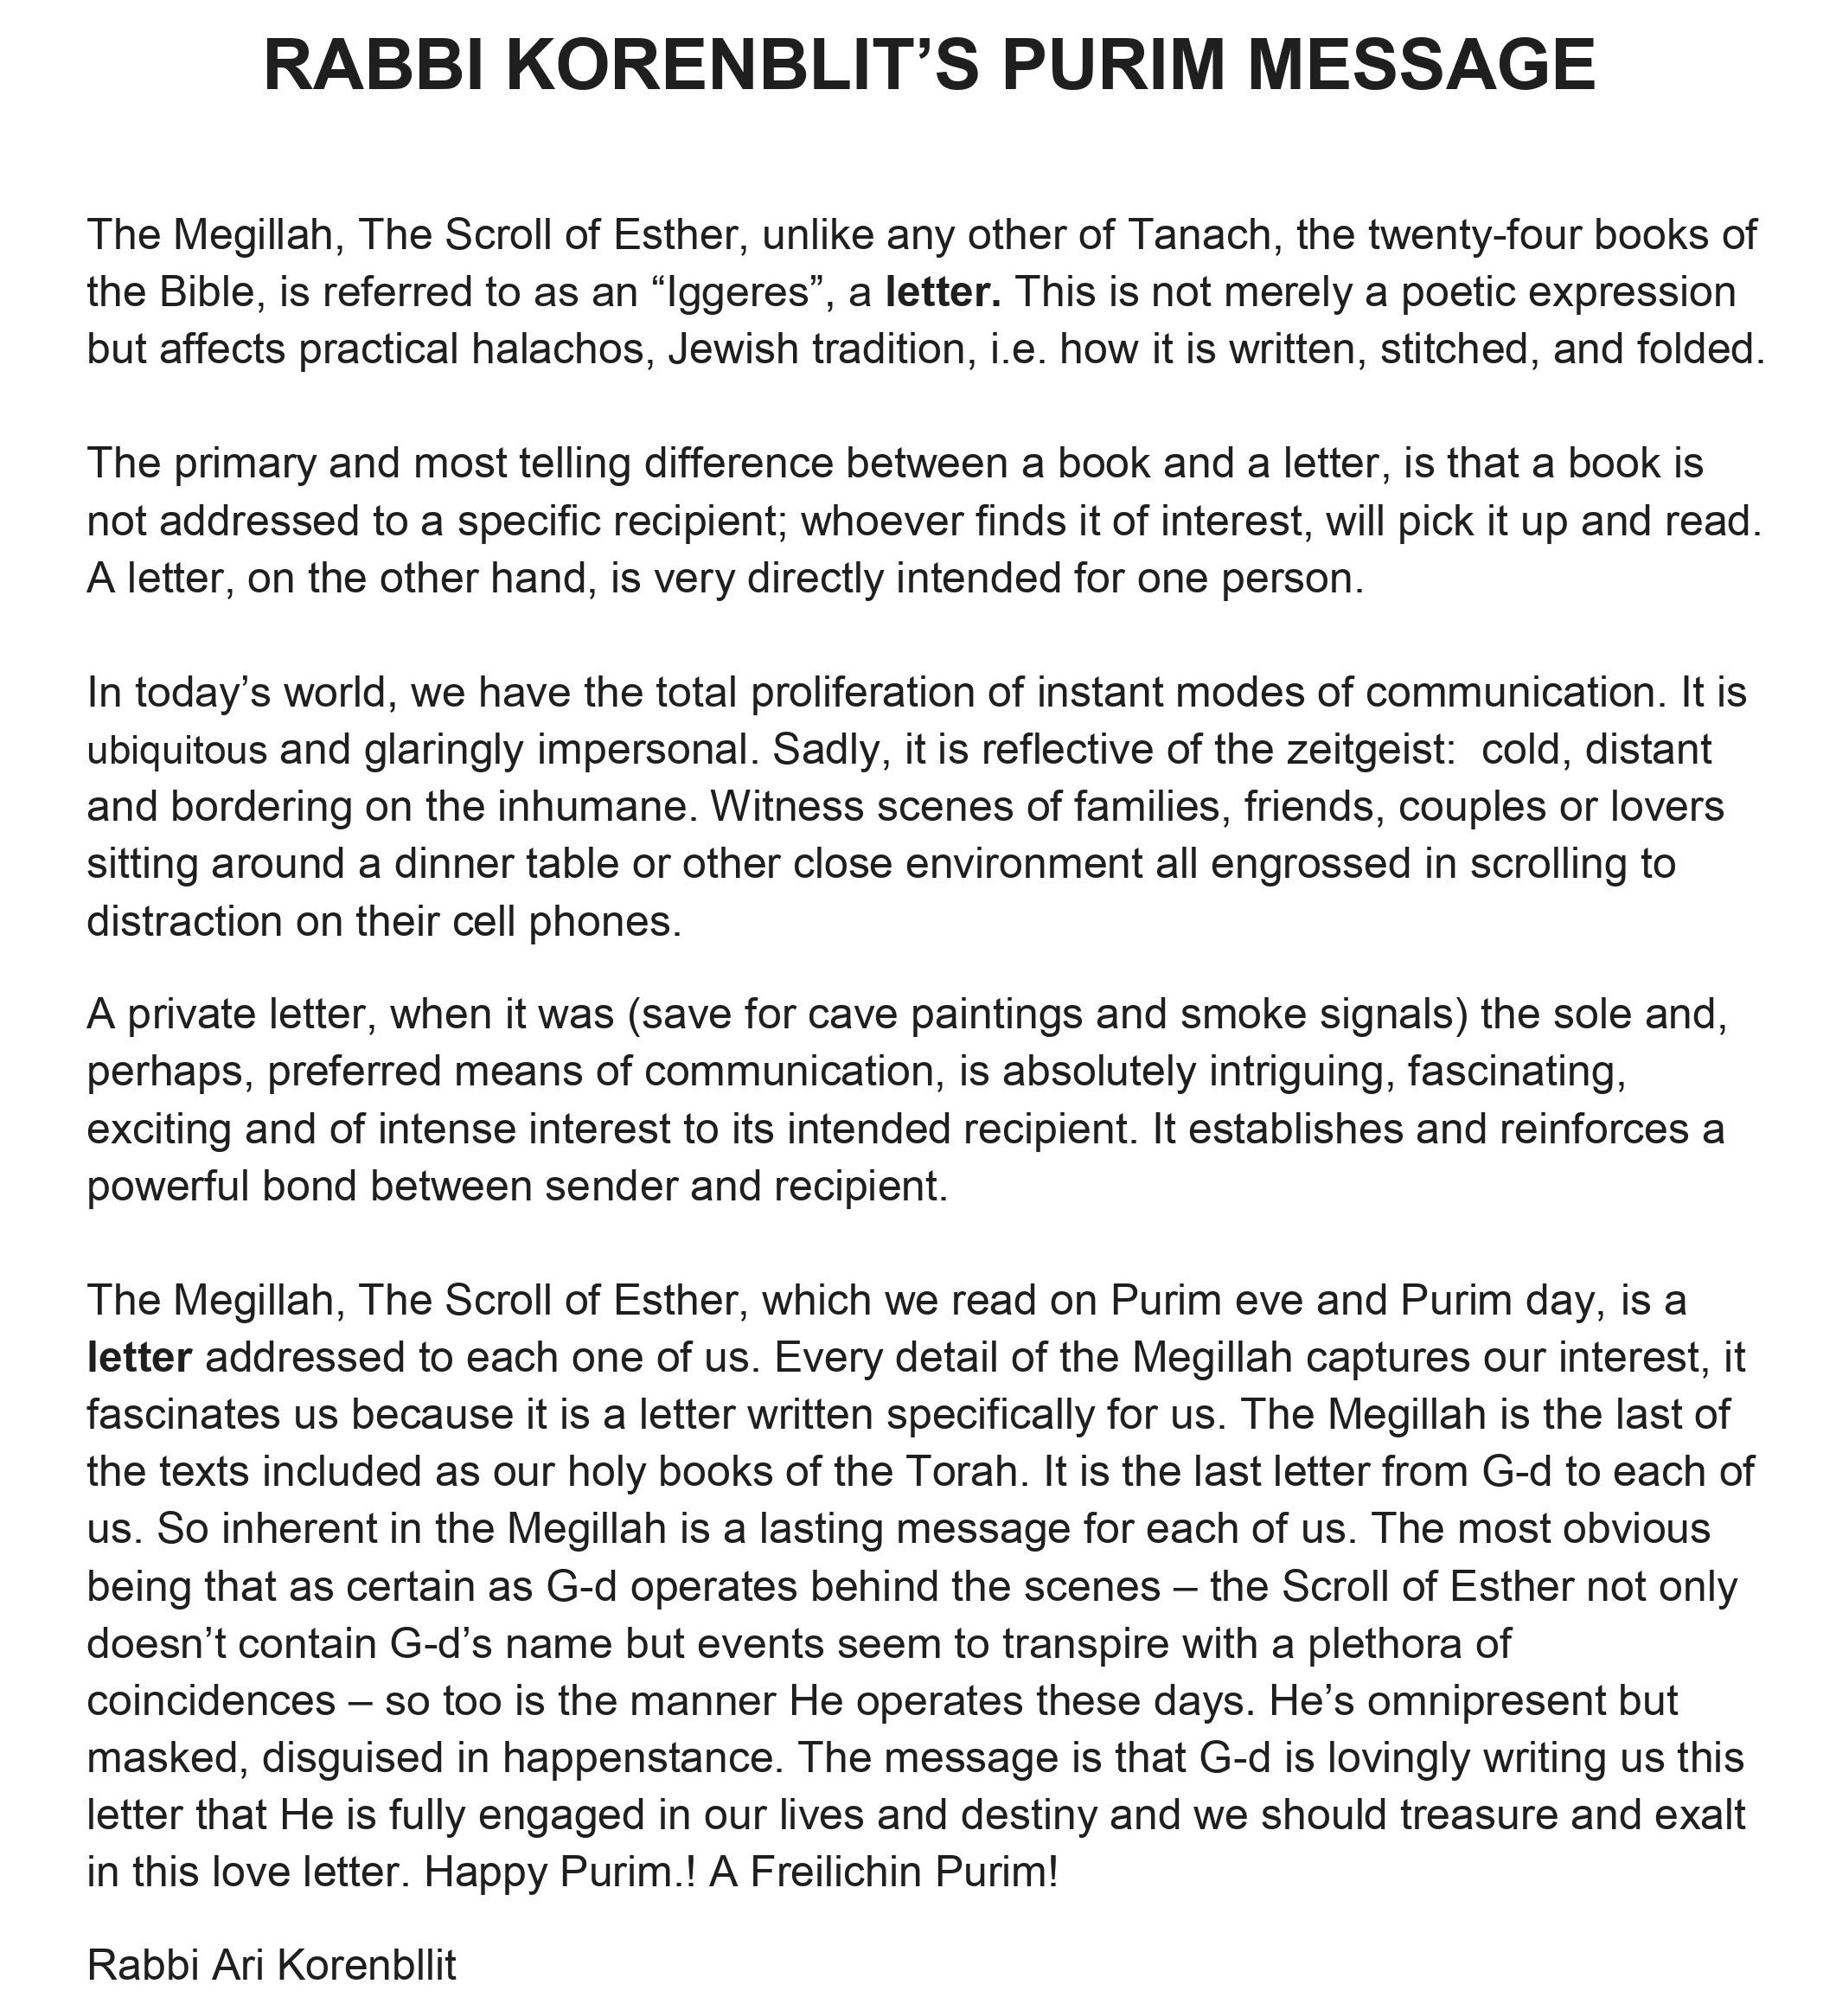 Rabbi Korenblit's Purim message 2021